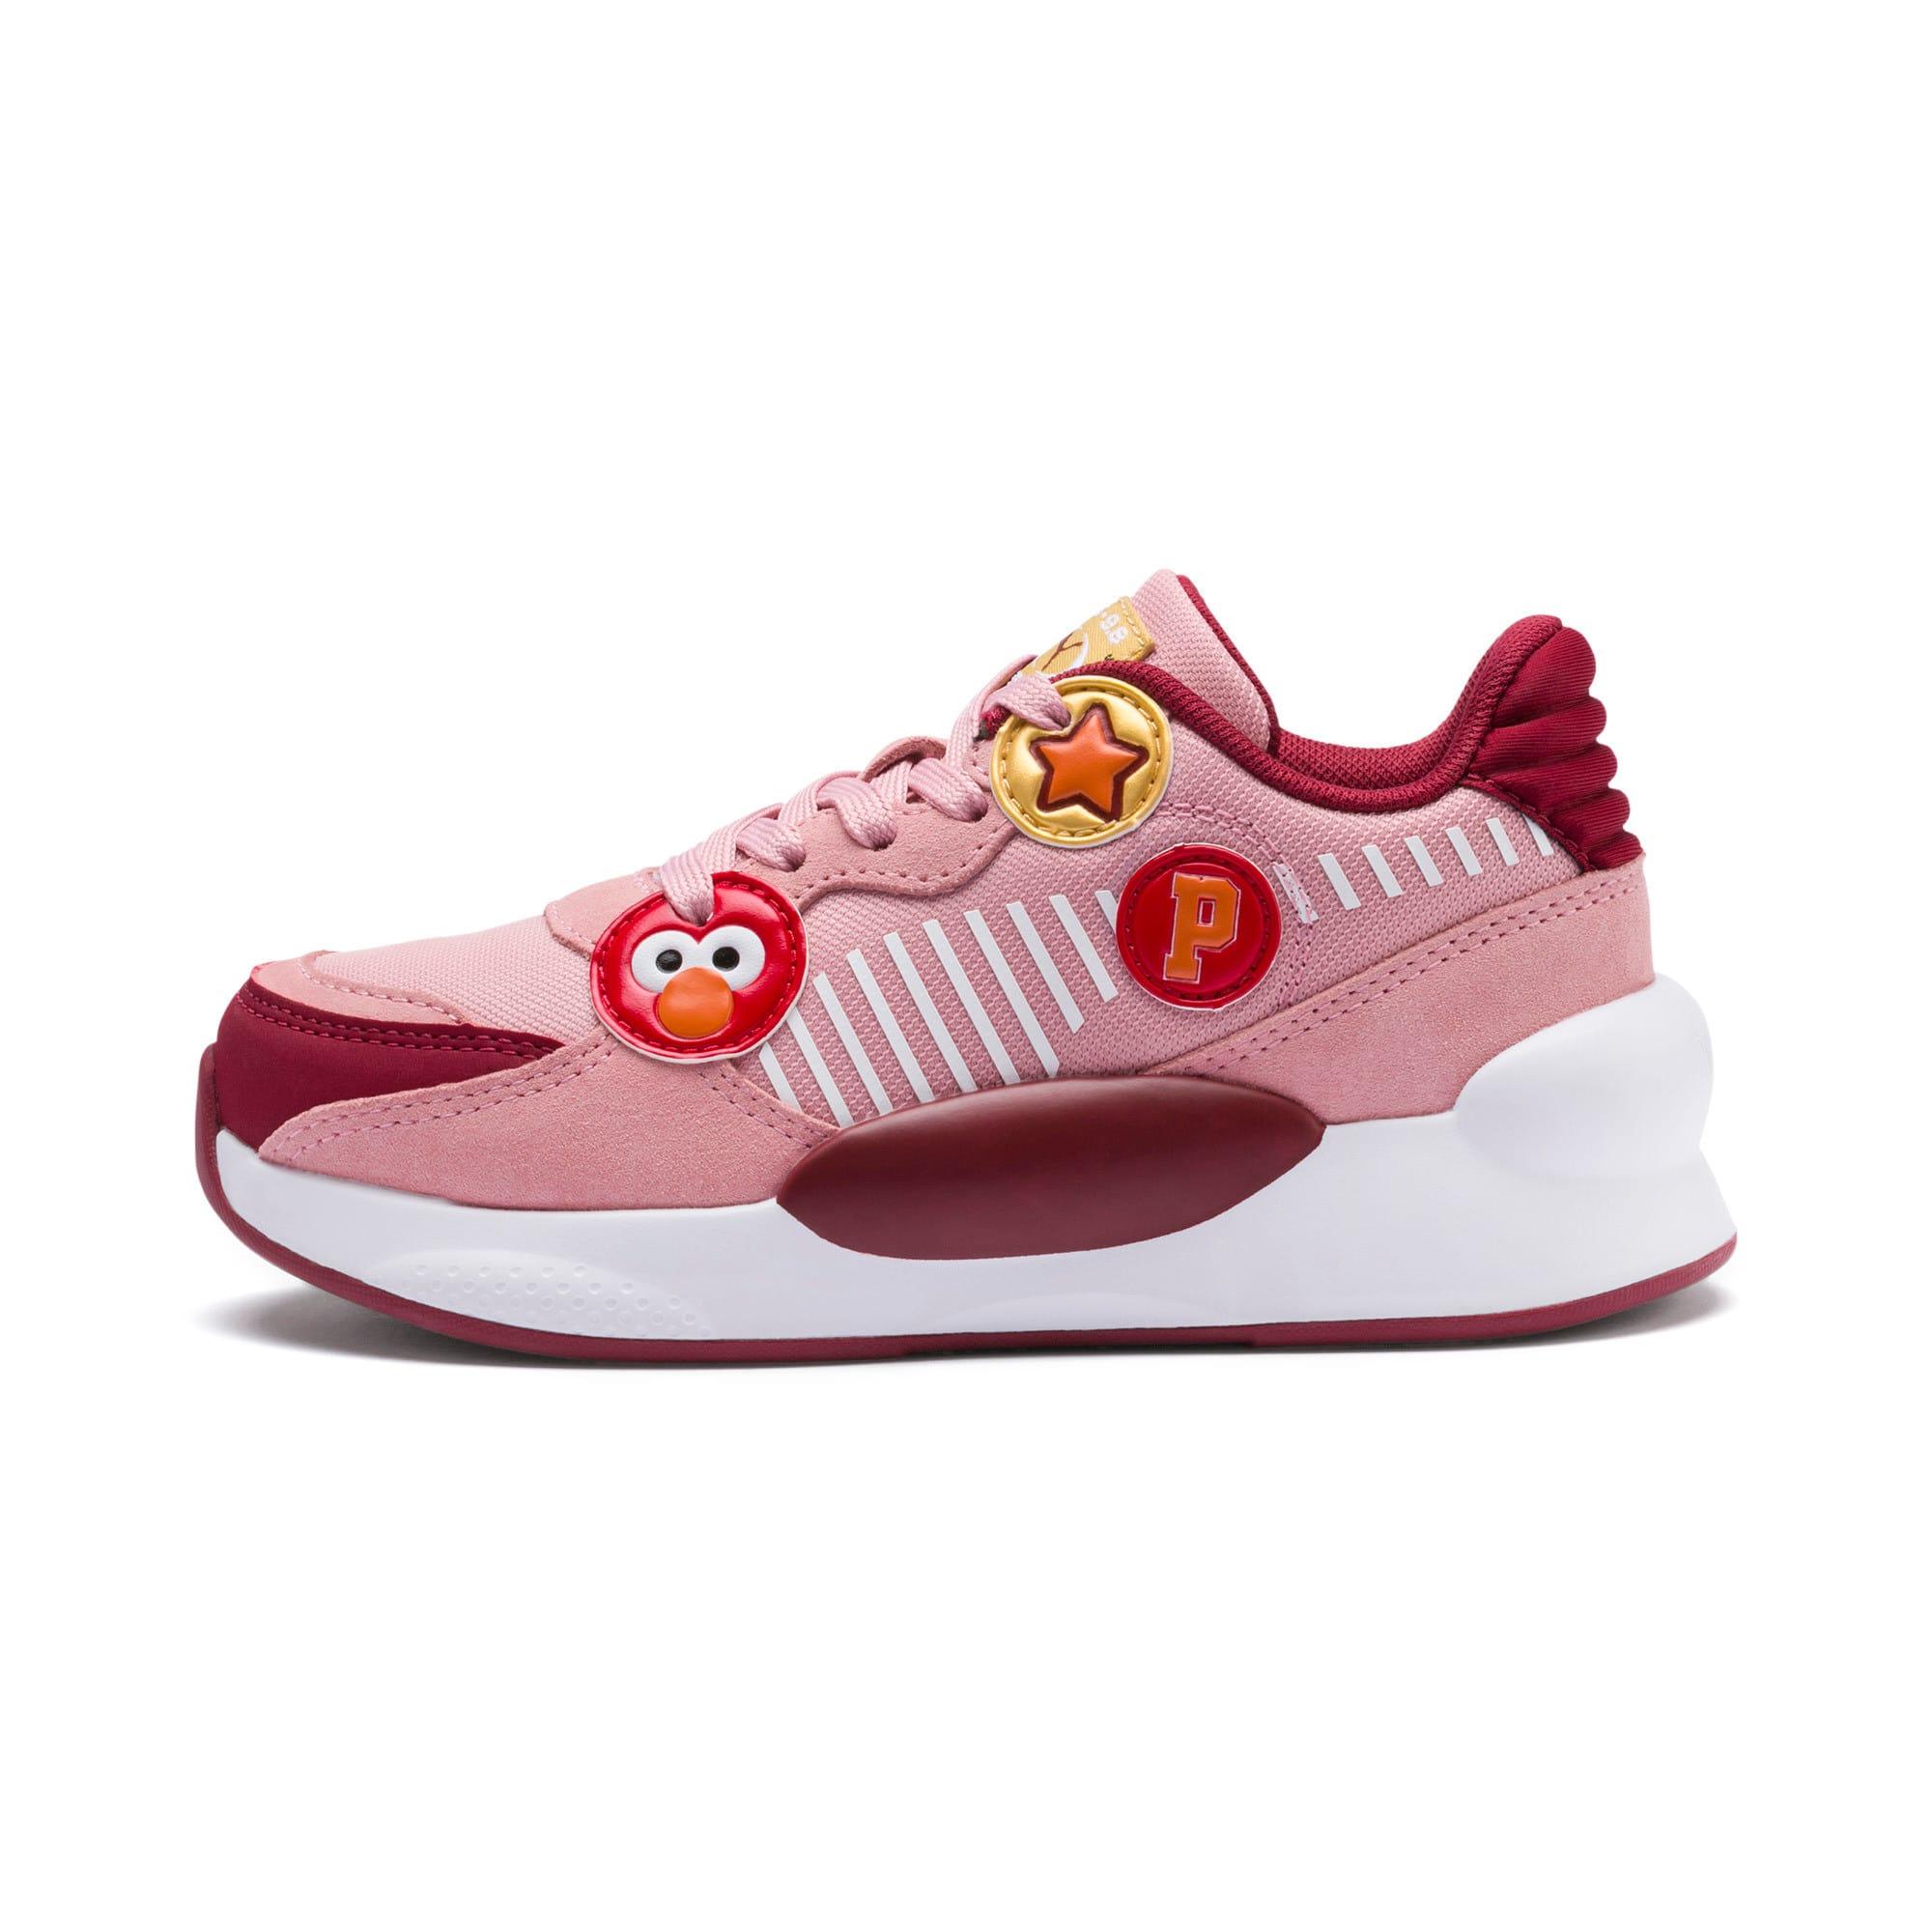 Thumbnail 1 of PUMA x SESAME STREET 50 RS 9.8 Little Kids' Shoes, Bridal Rose-Rhubarb, medium